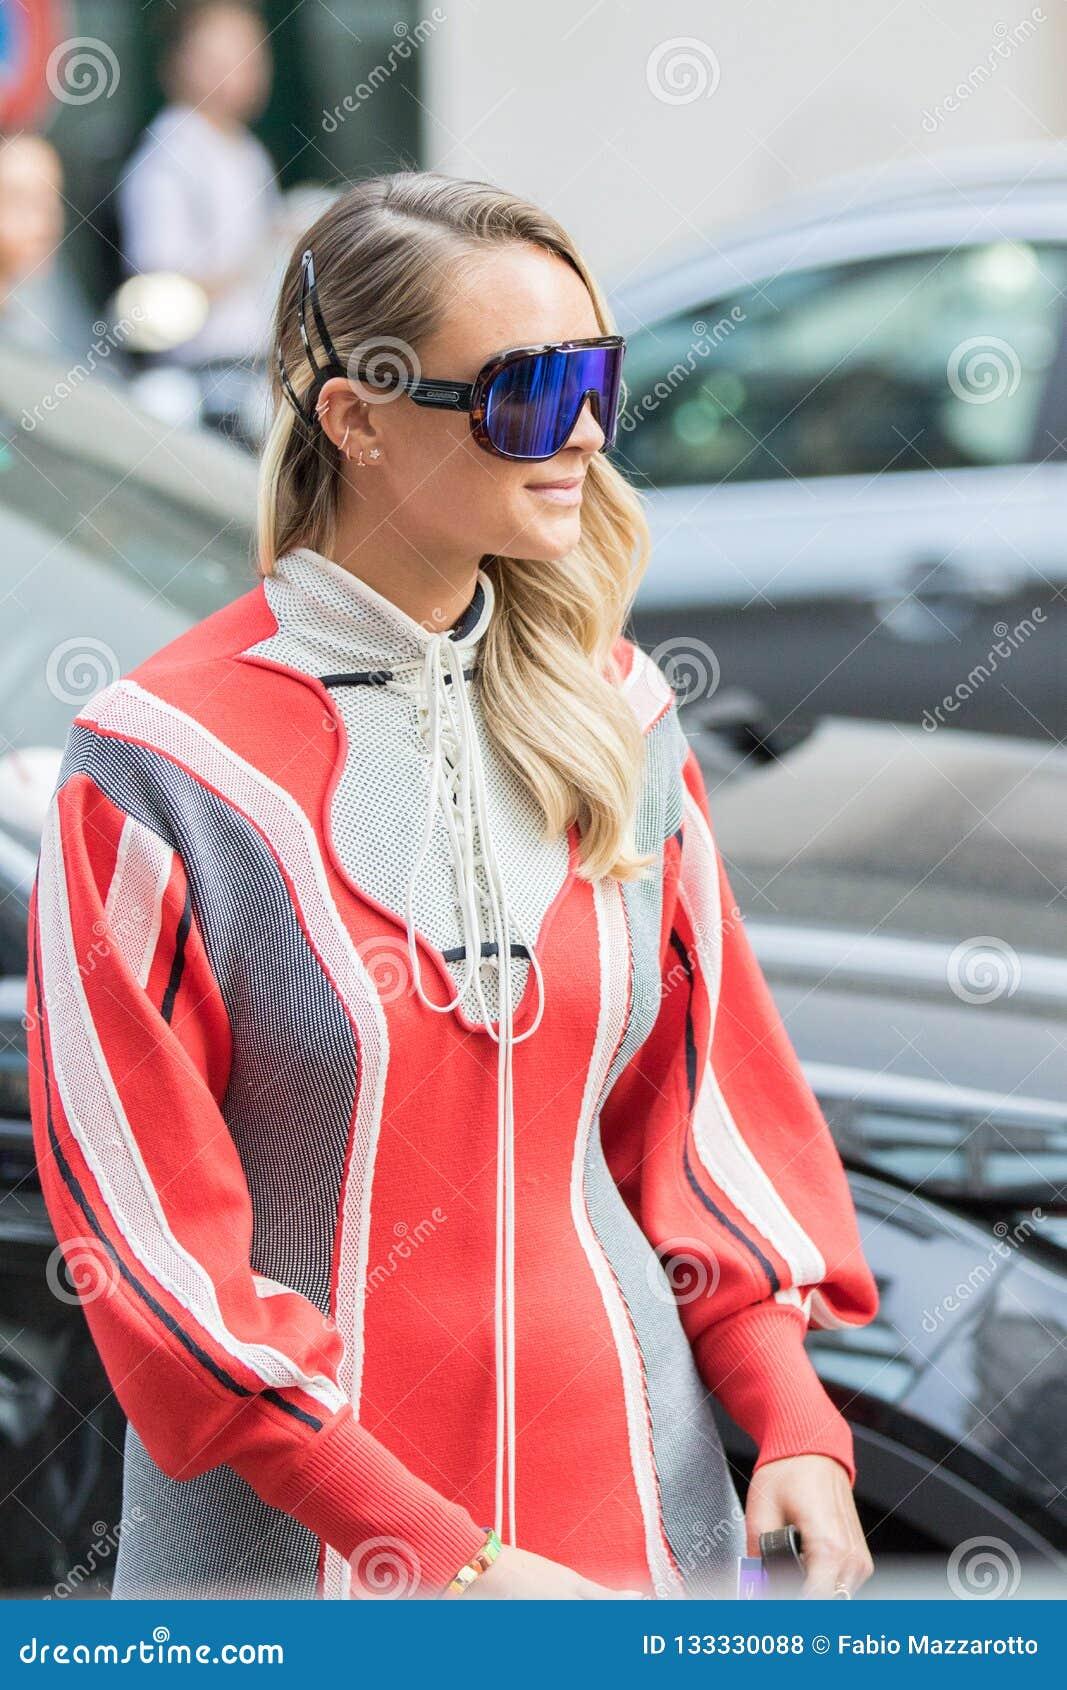 new product c7694 c9cf5 Milan Woman Fashion Week 2018 Editorial Stock Photo - Image ...